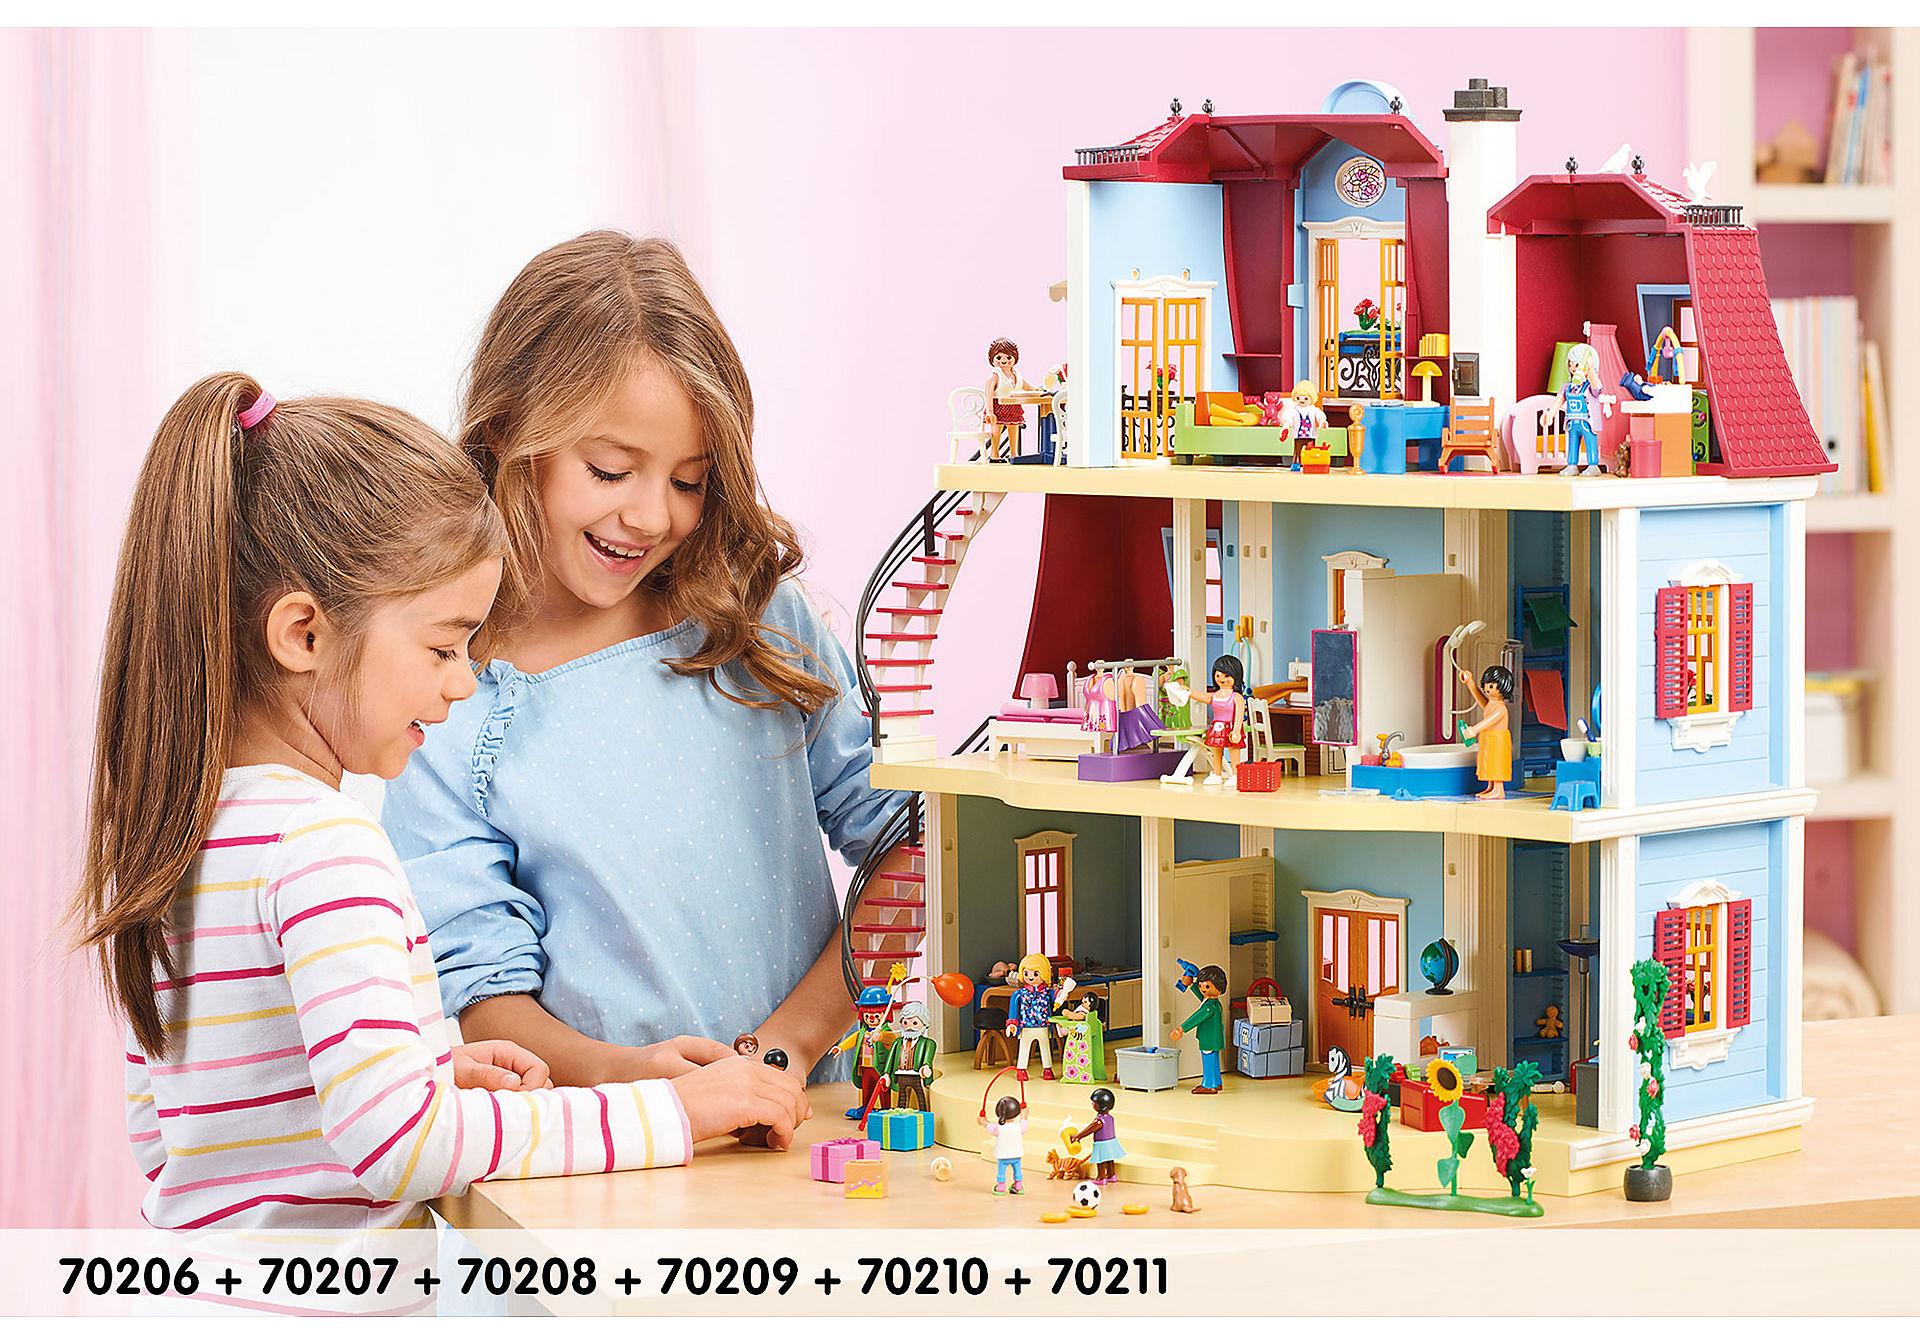 70205 Mein Großes Puppenhaus zoom image8